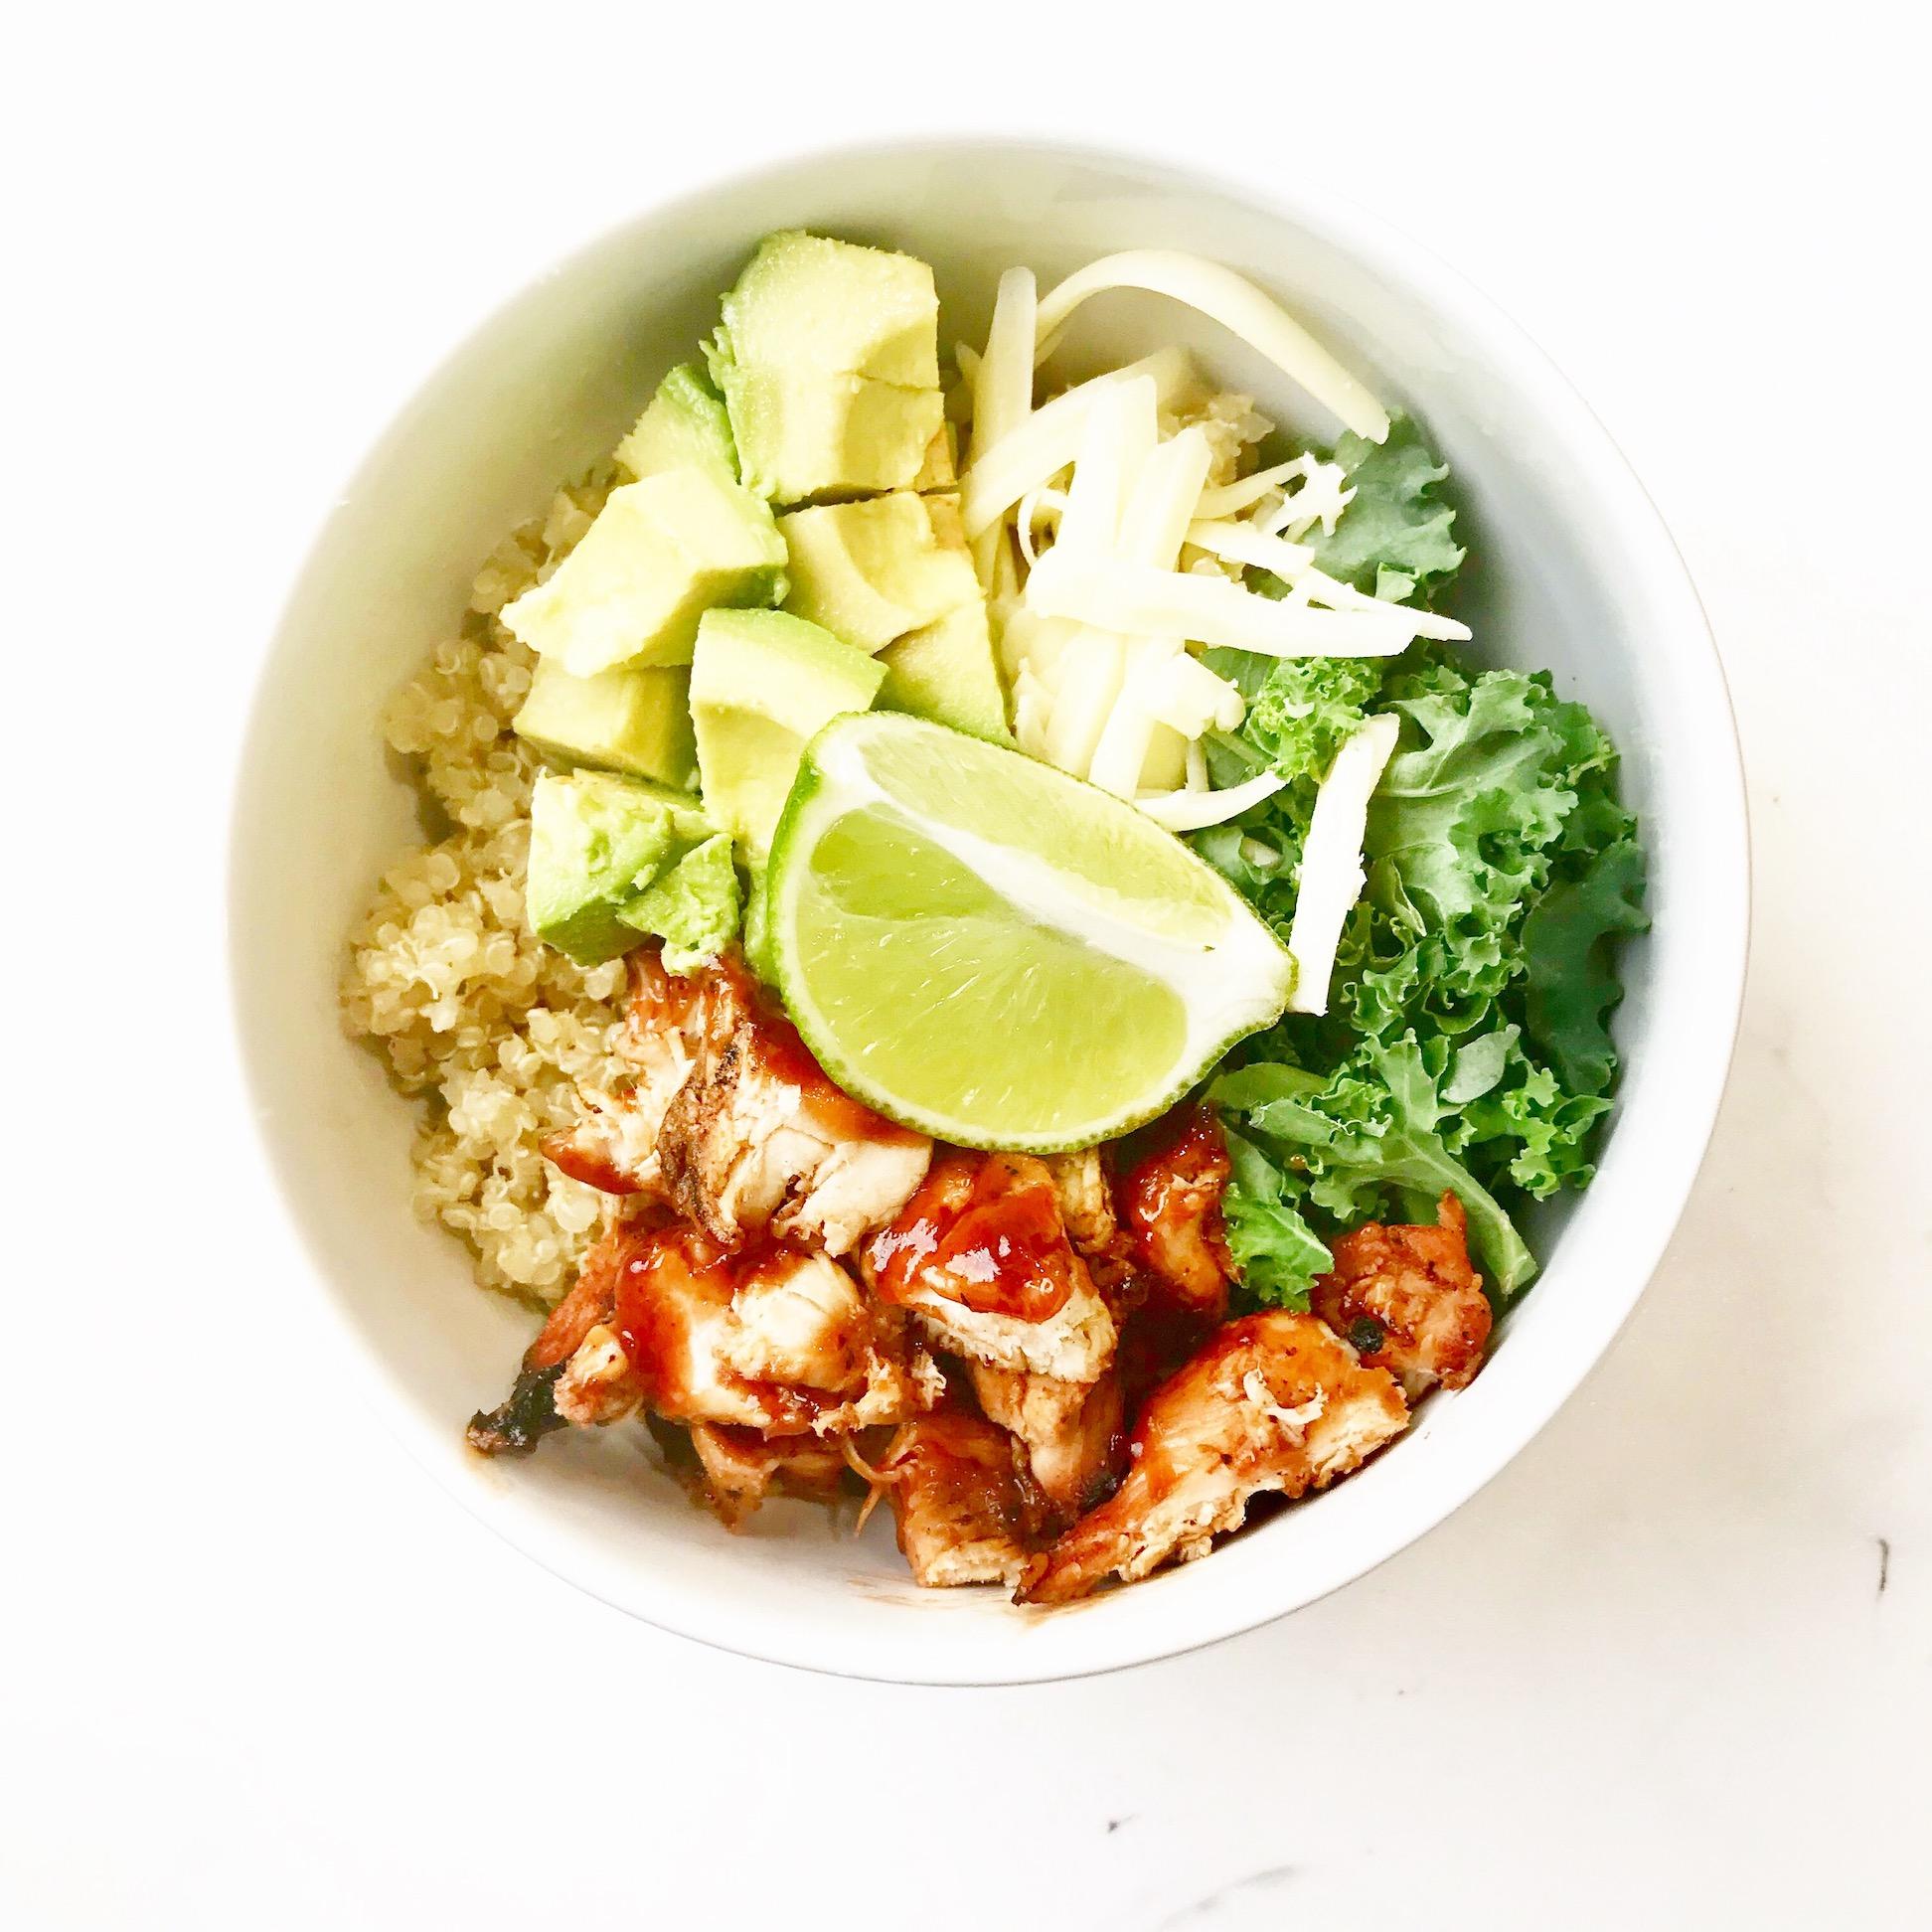 BBQ chicken quinoa bowl